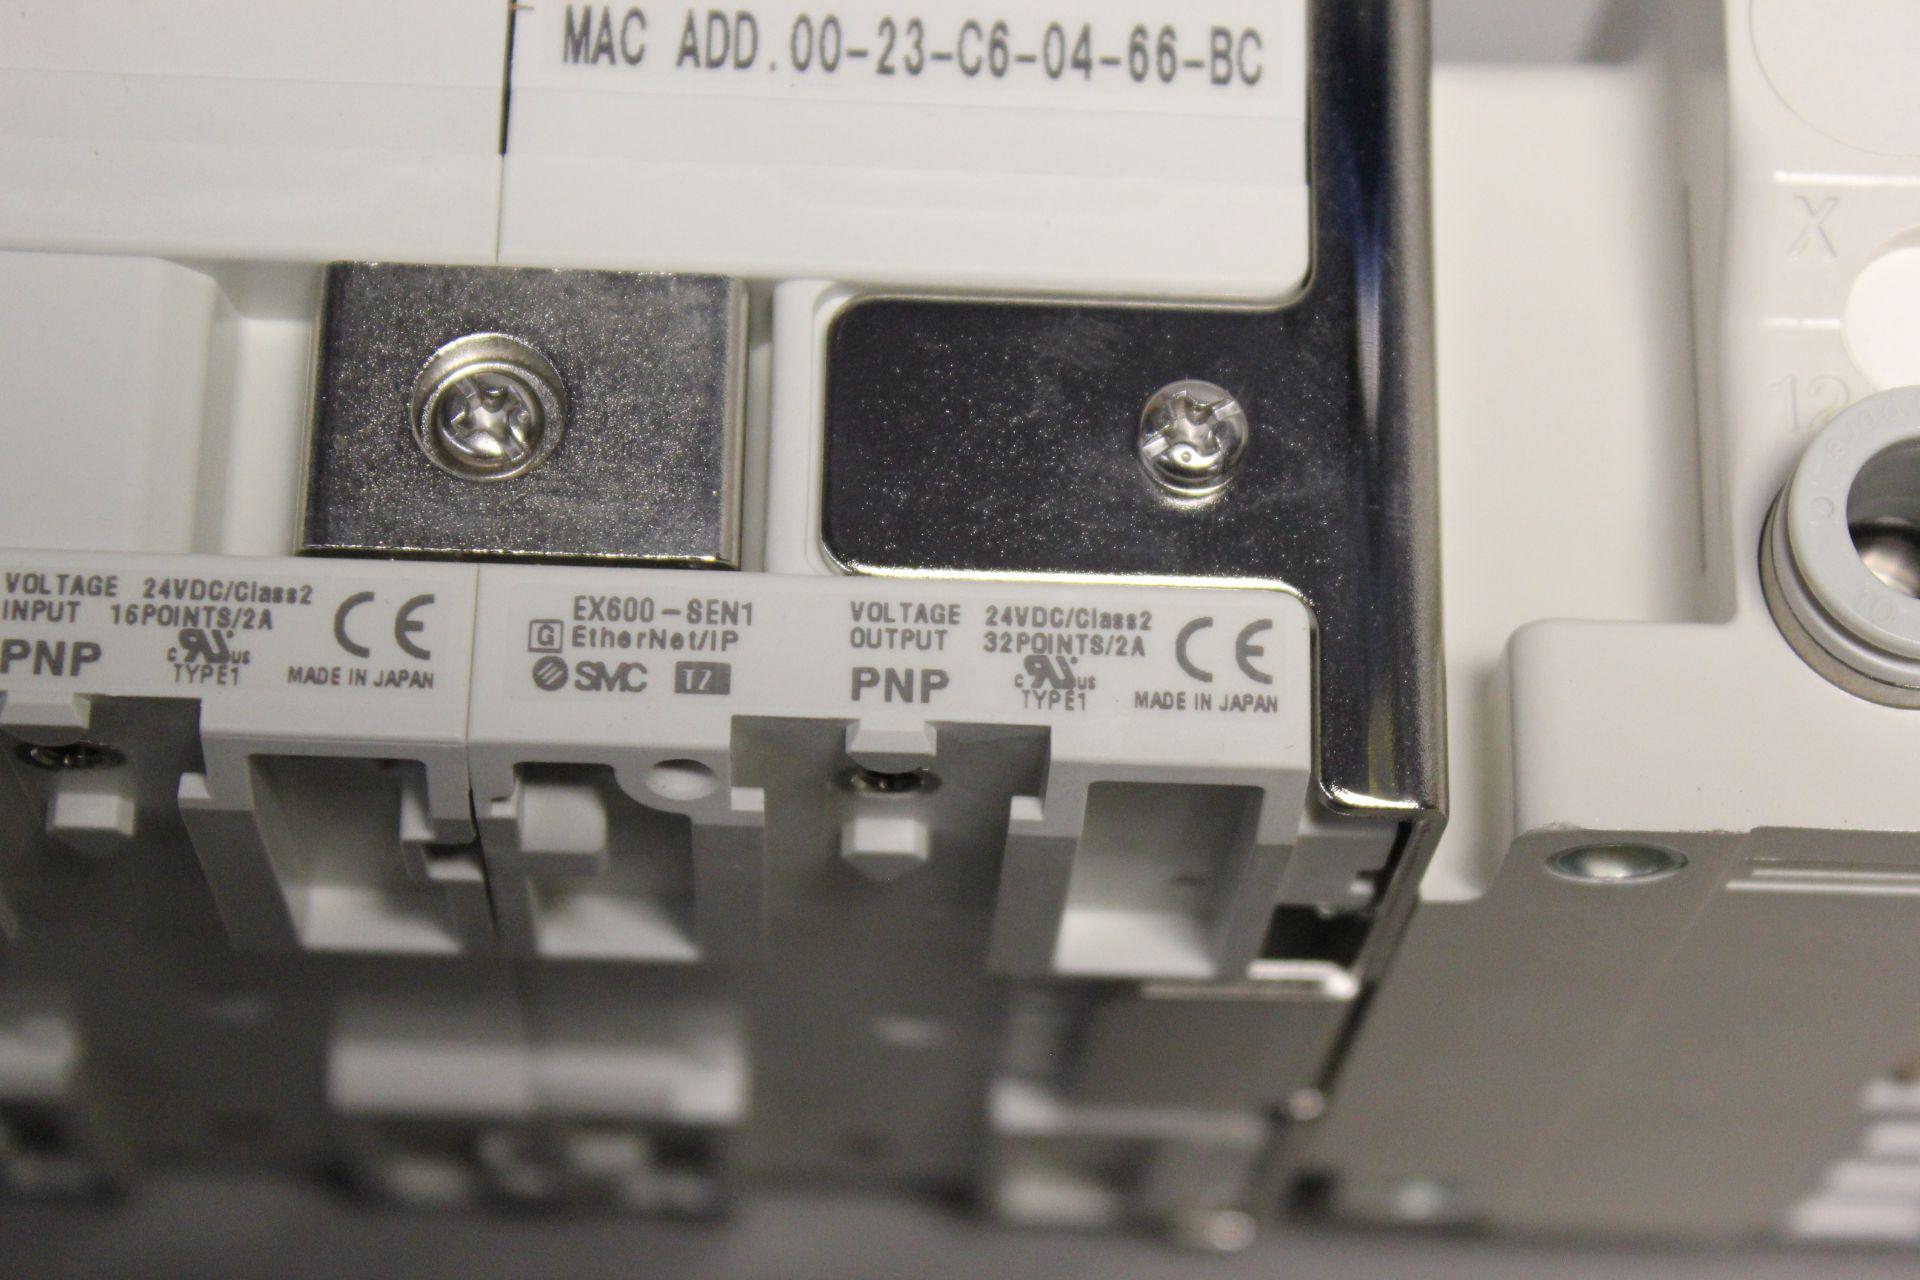 NEW SMC MANIFOLD WITH SOLENOID VALVES, ETHERNET/IP I/O - Image 8 of 8